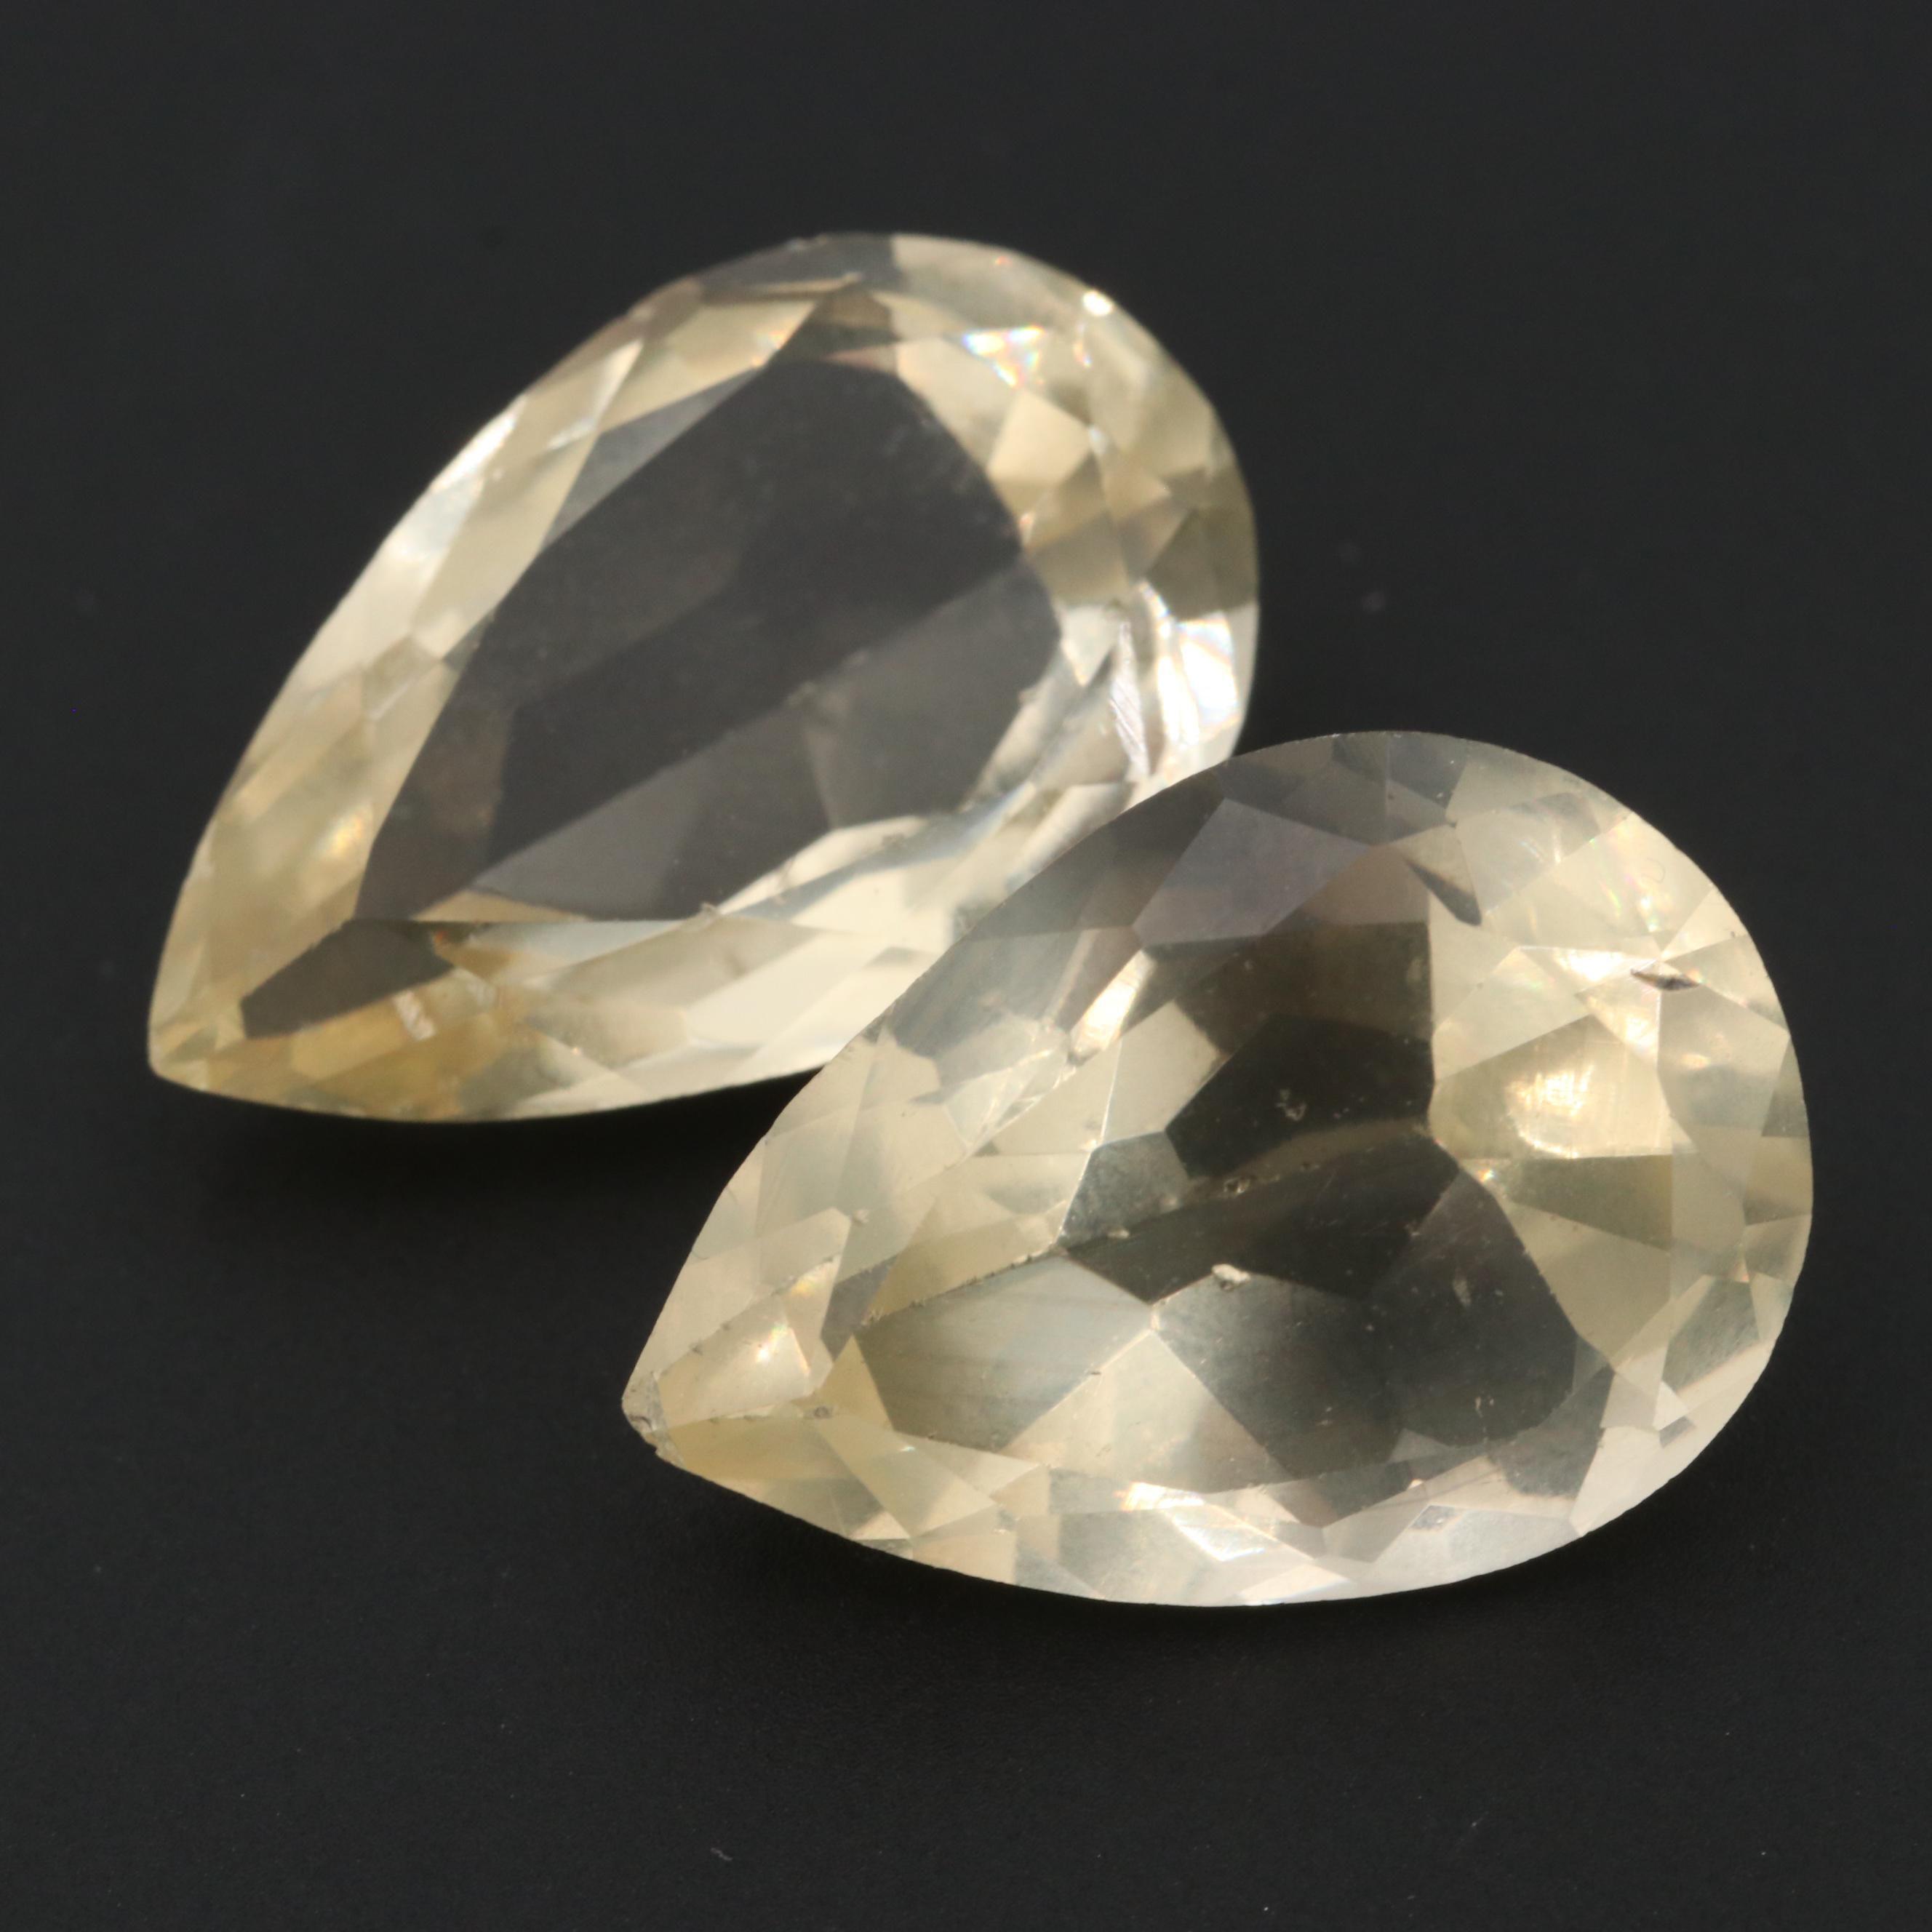 Loose 13.70 CTW Labradorite Feldspar Gemstones